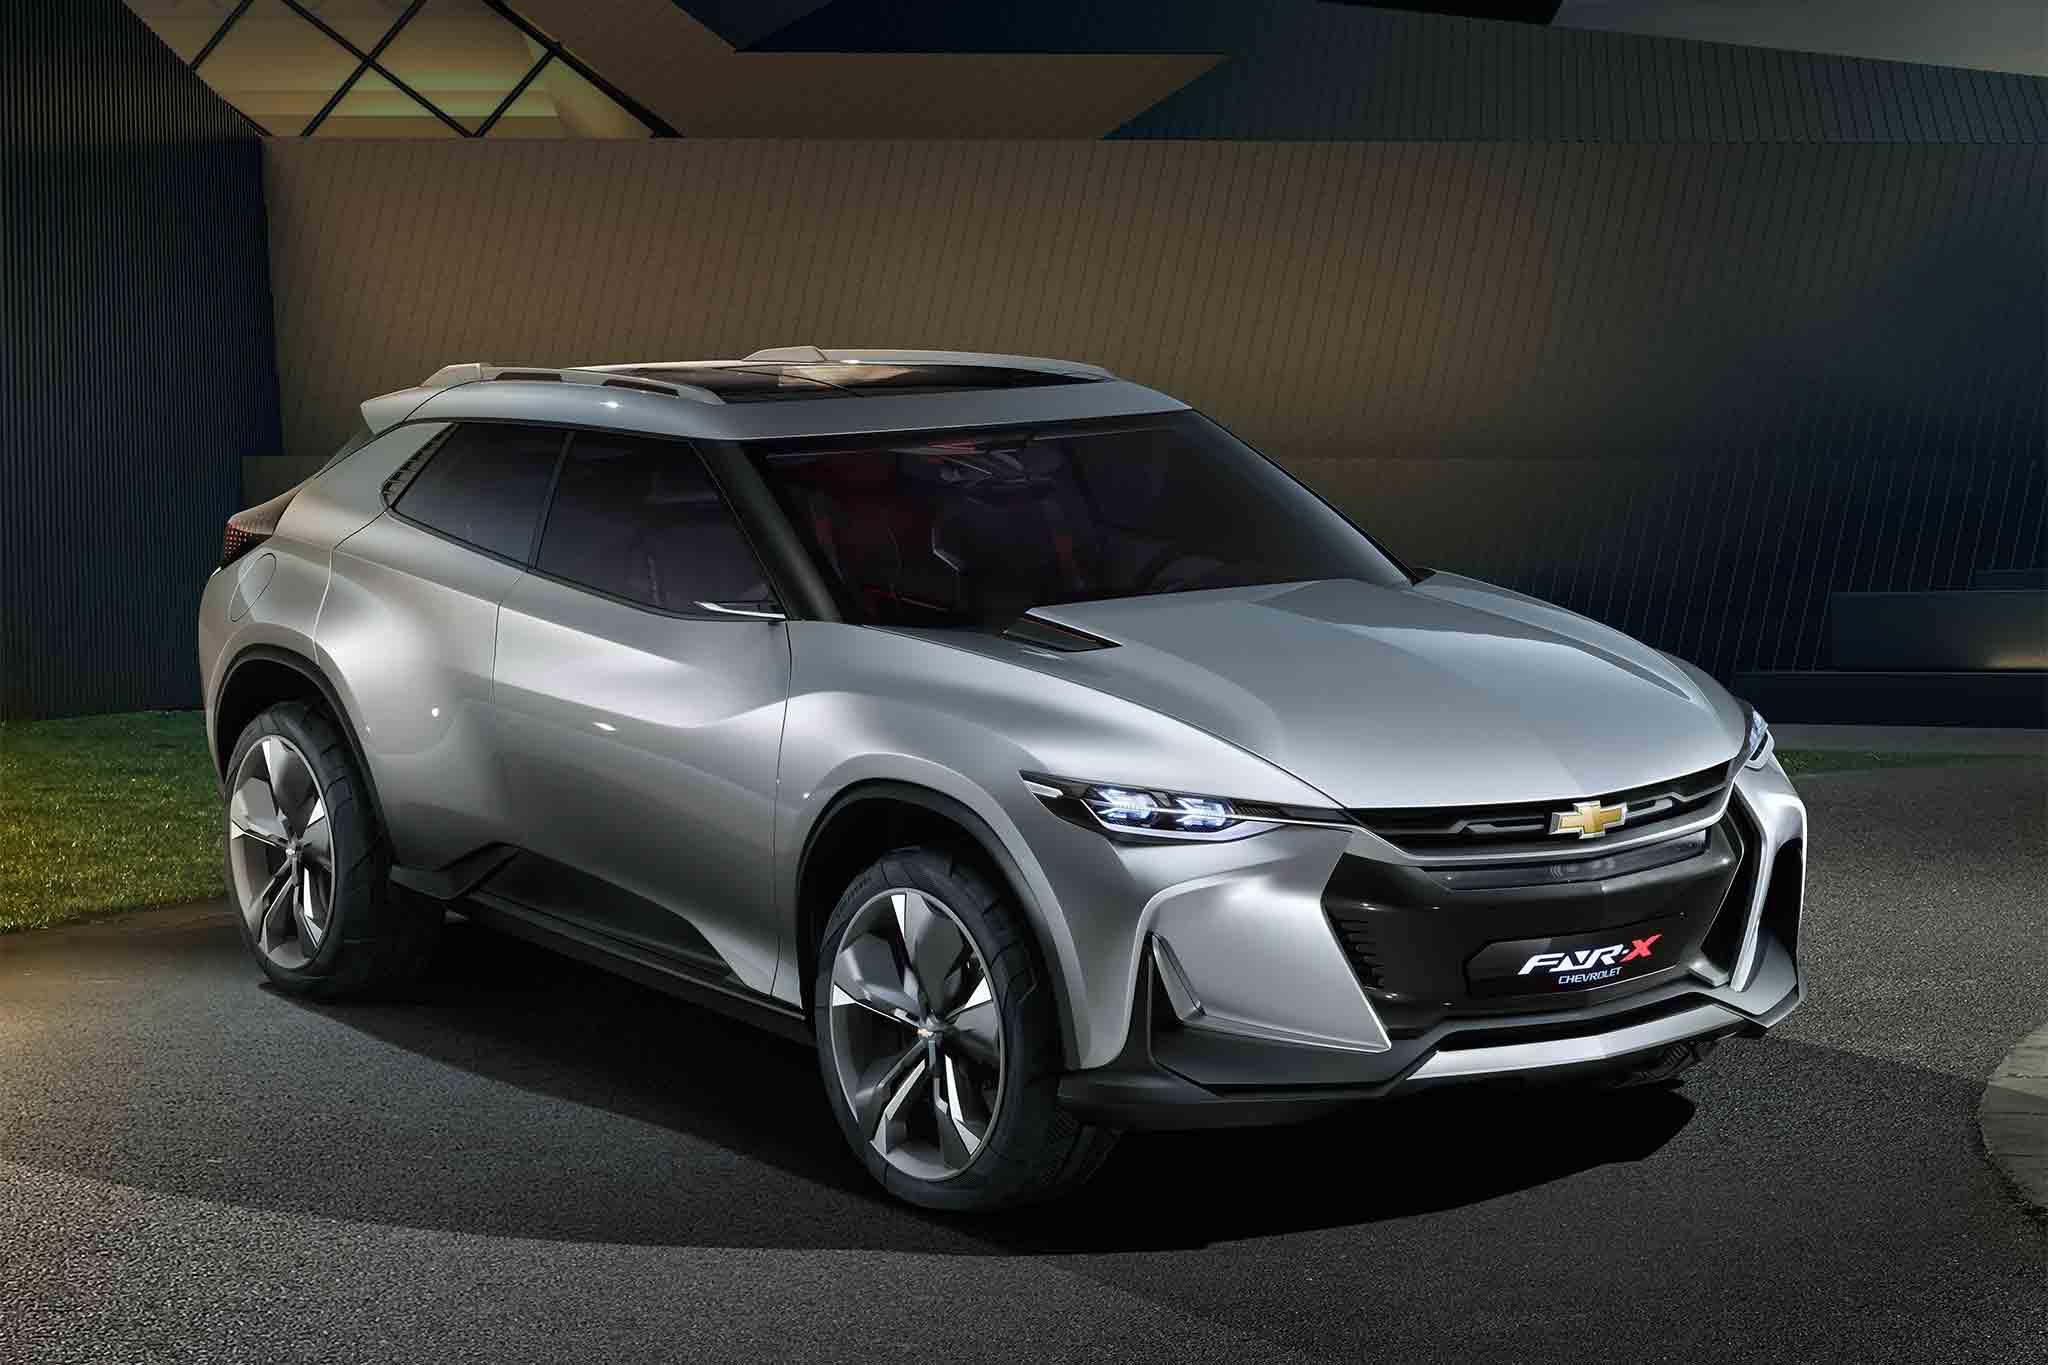 Chevrolet FNR X All Purpose Sports Concept Vehicle Front Three Quarter 1